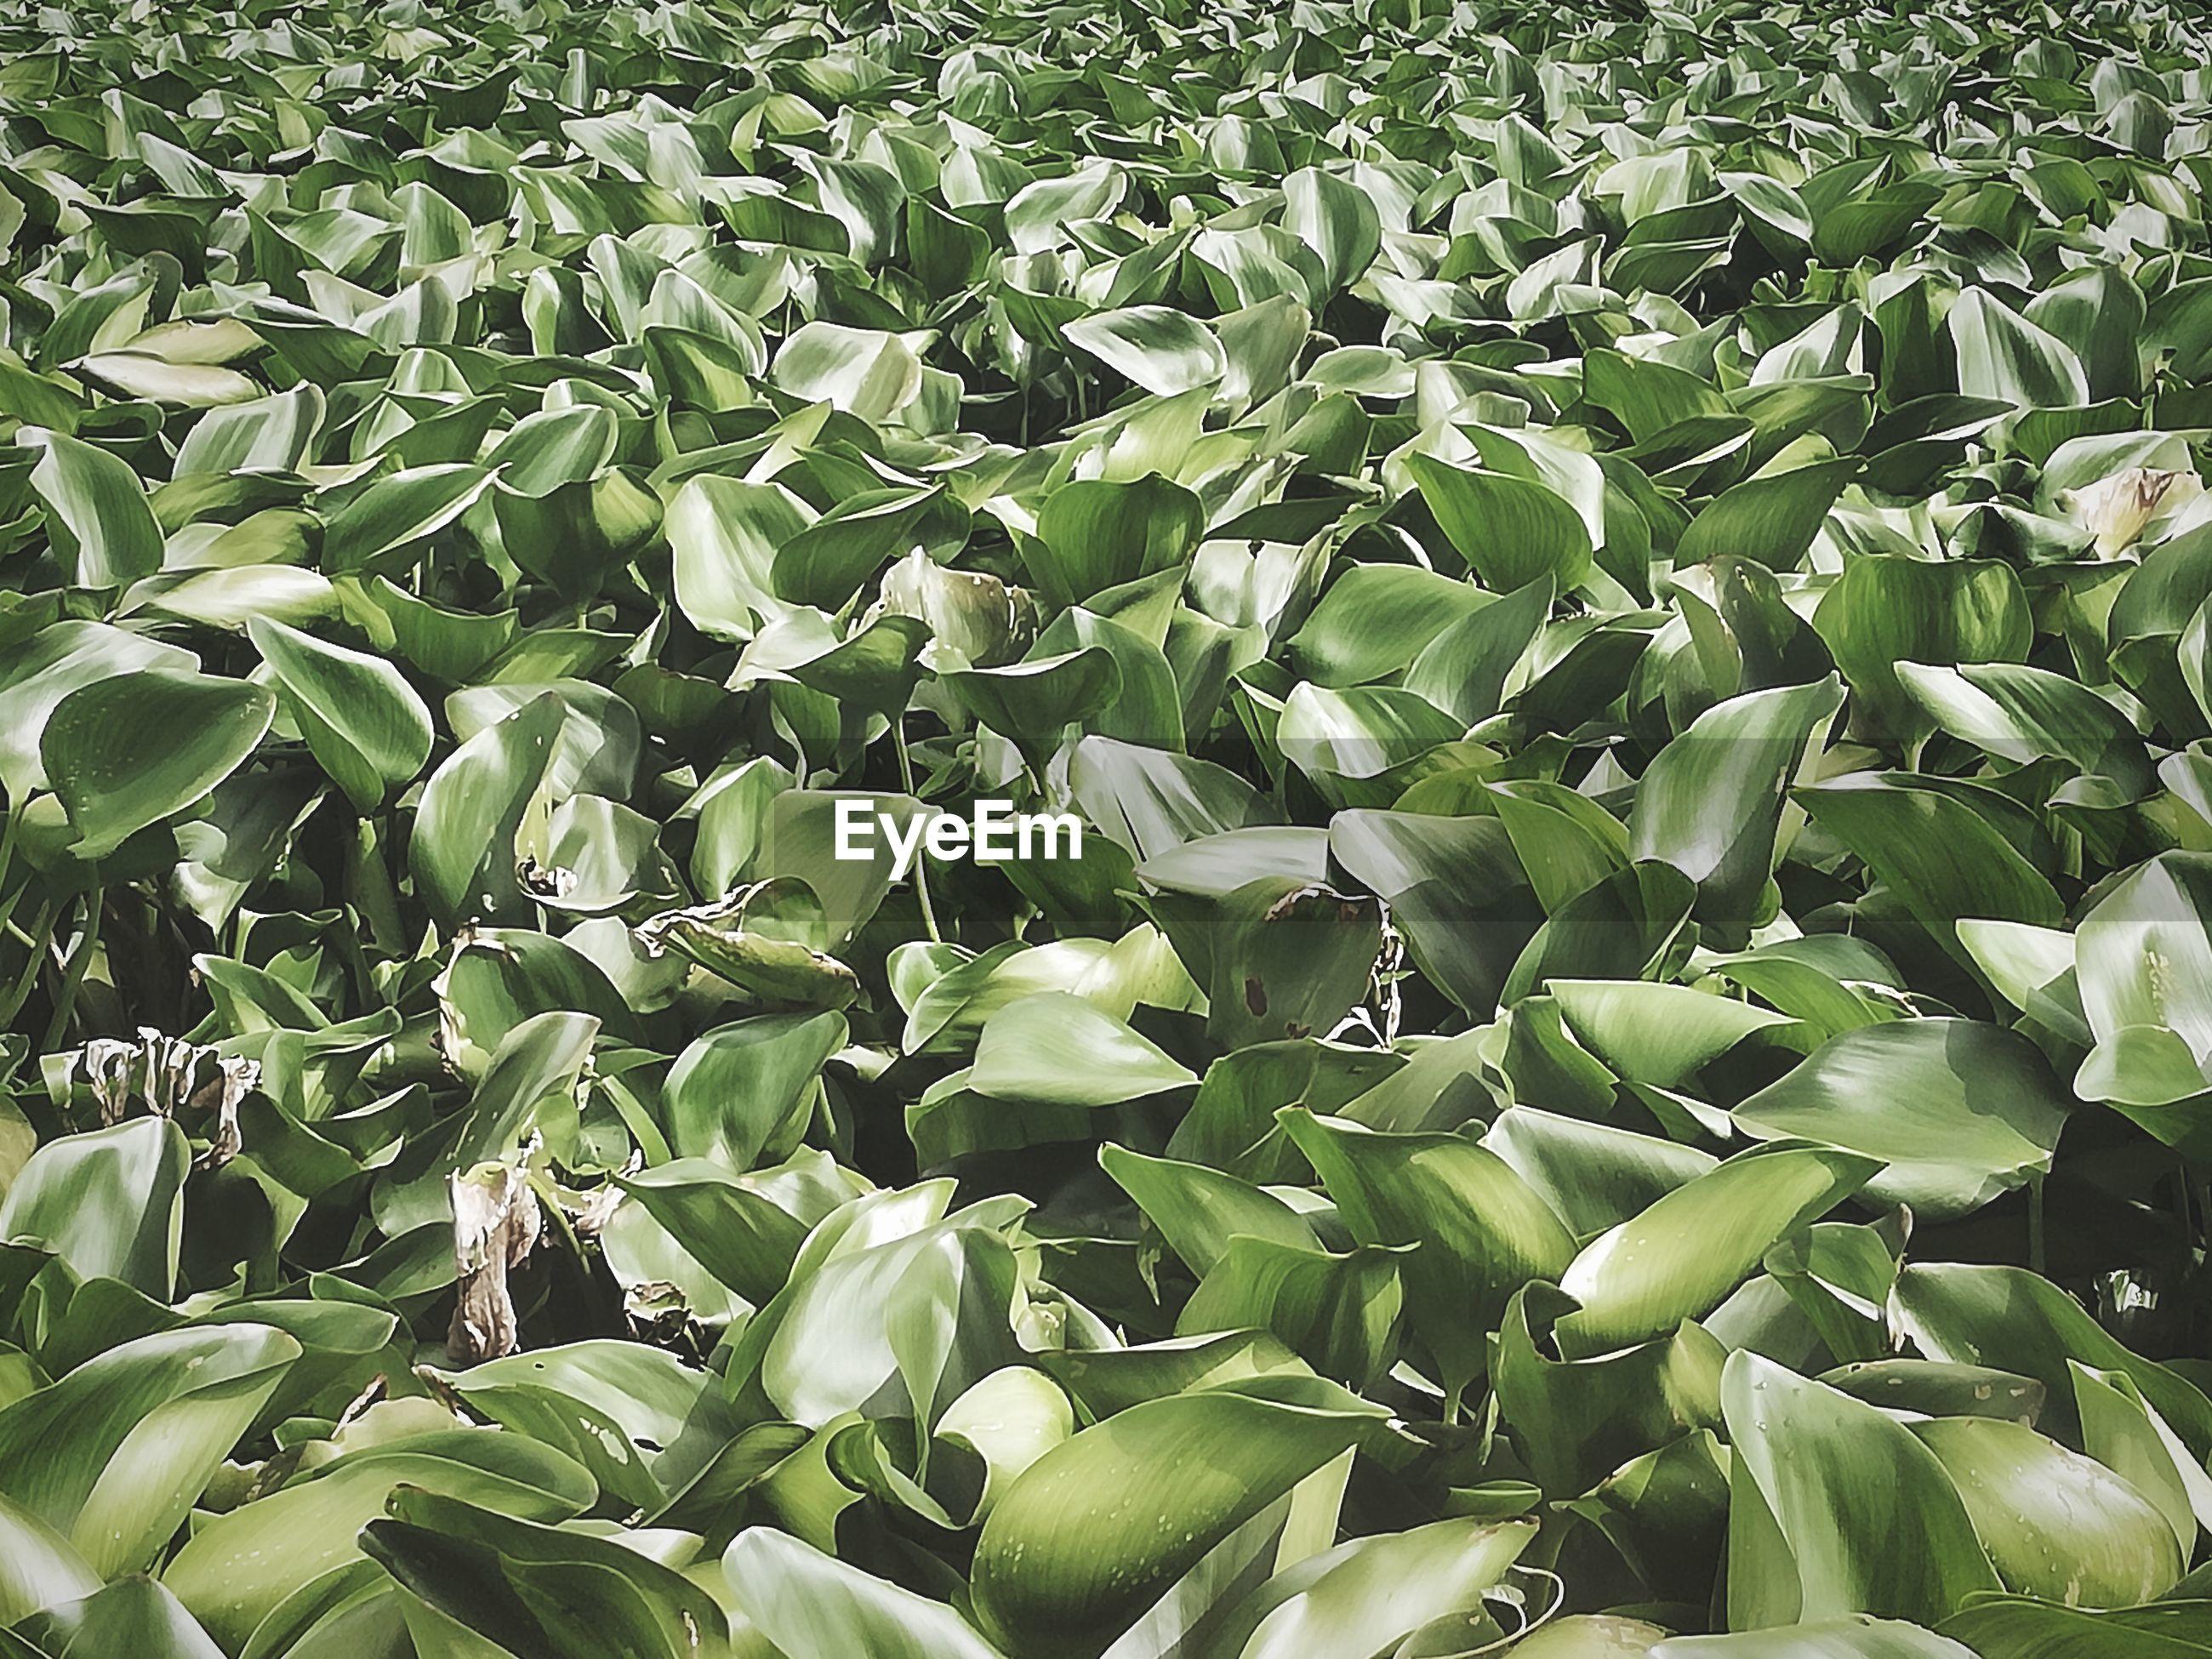 FULL FRAME SHOT OF PLANTS GROWING IN LAND